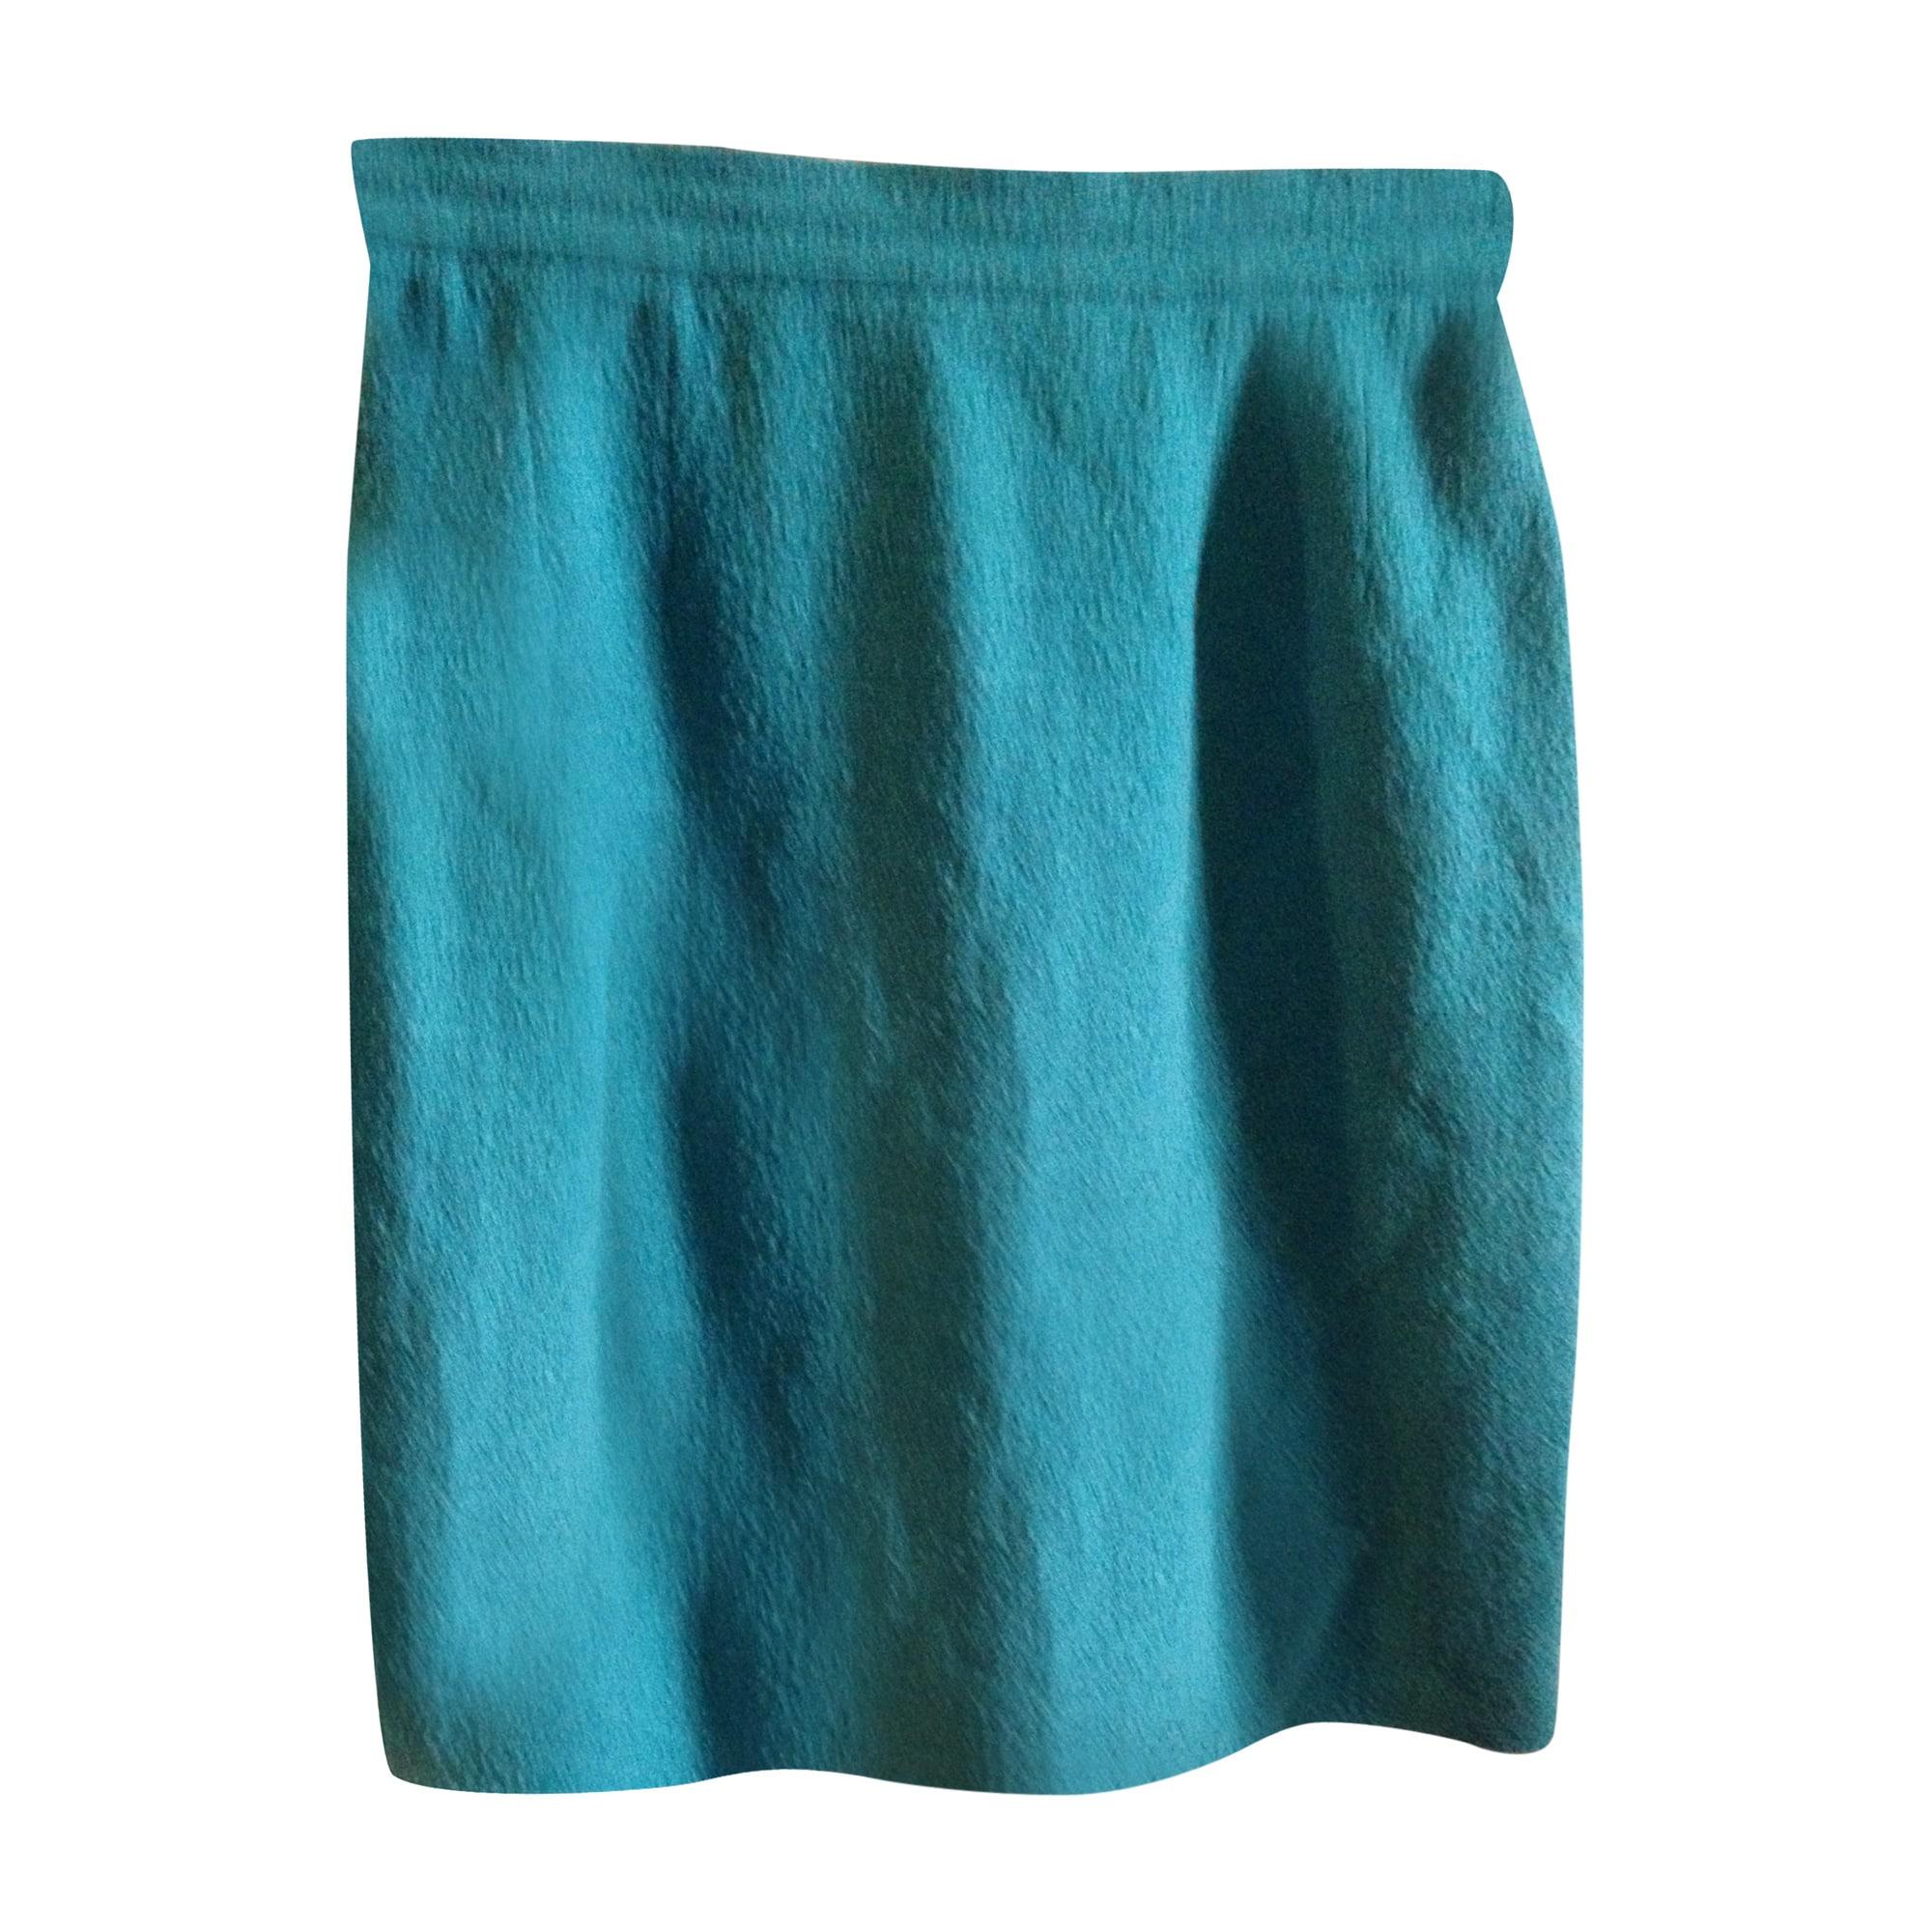 Jupe mi-longue CHANEL Bleu, bleu marine, bleu turquoise